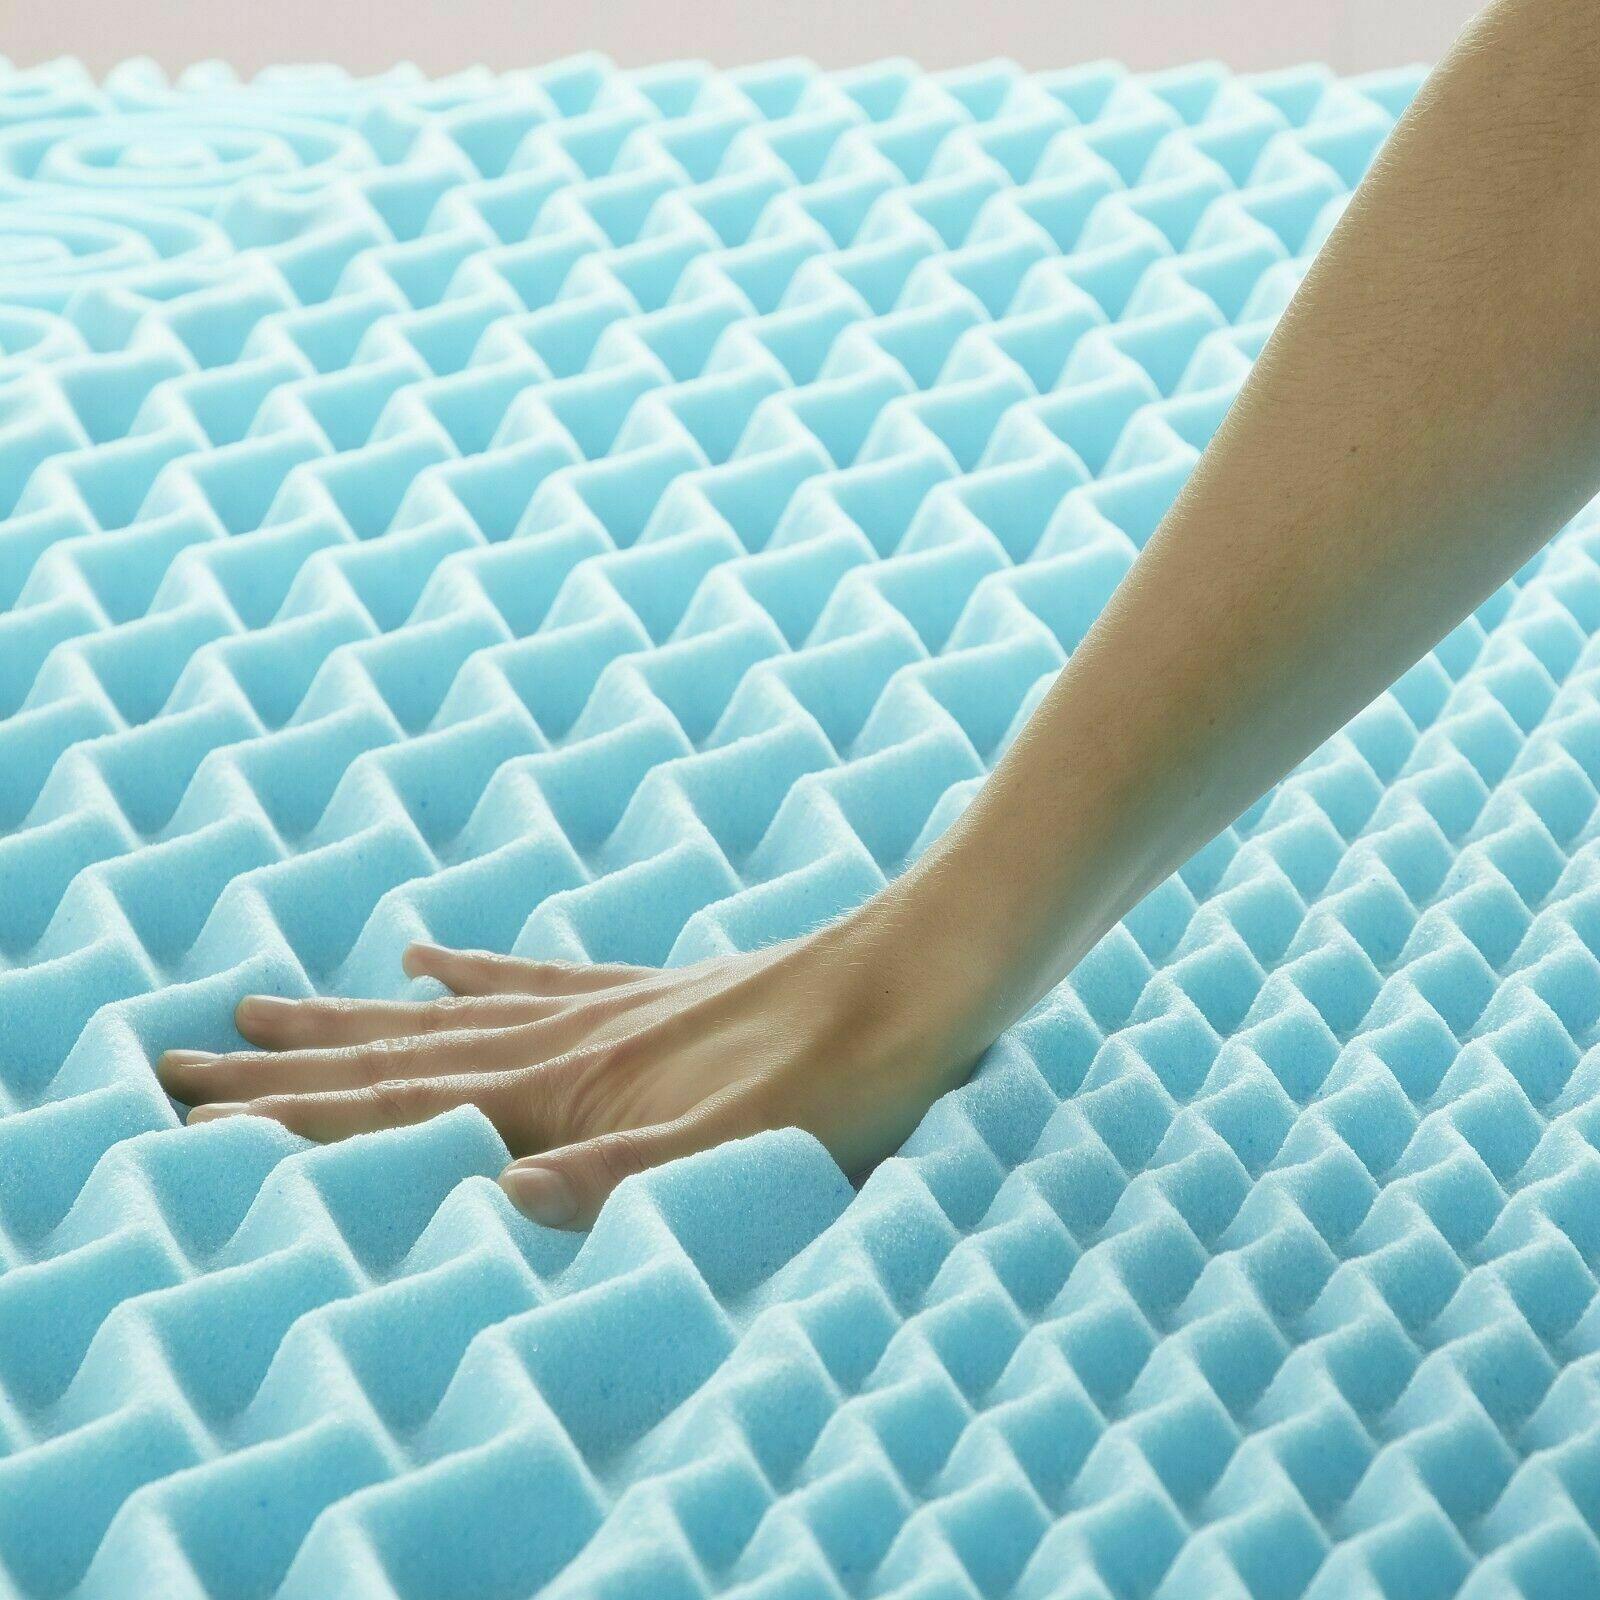 Orthopedic 5 Zone Authentic Comfort Inch Foam Mattress Topper Cover